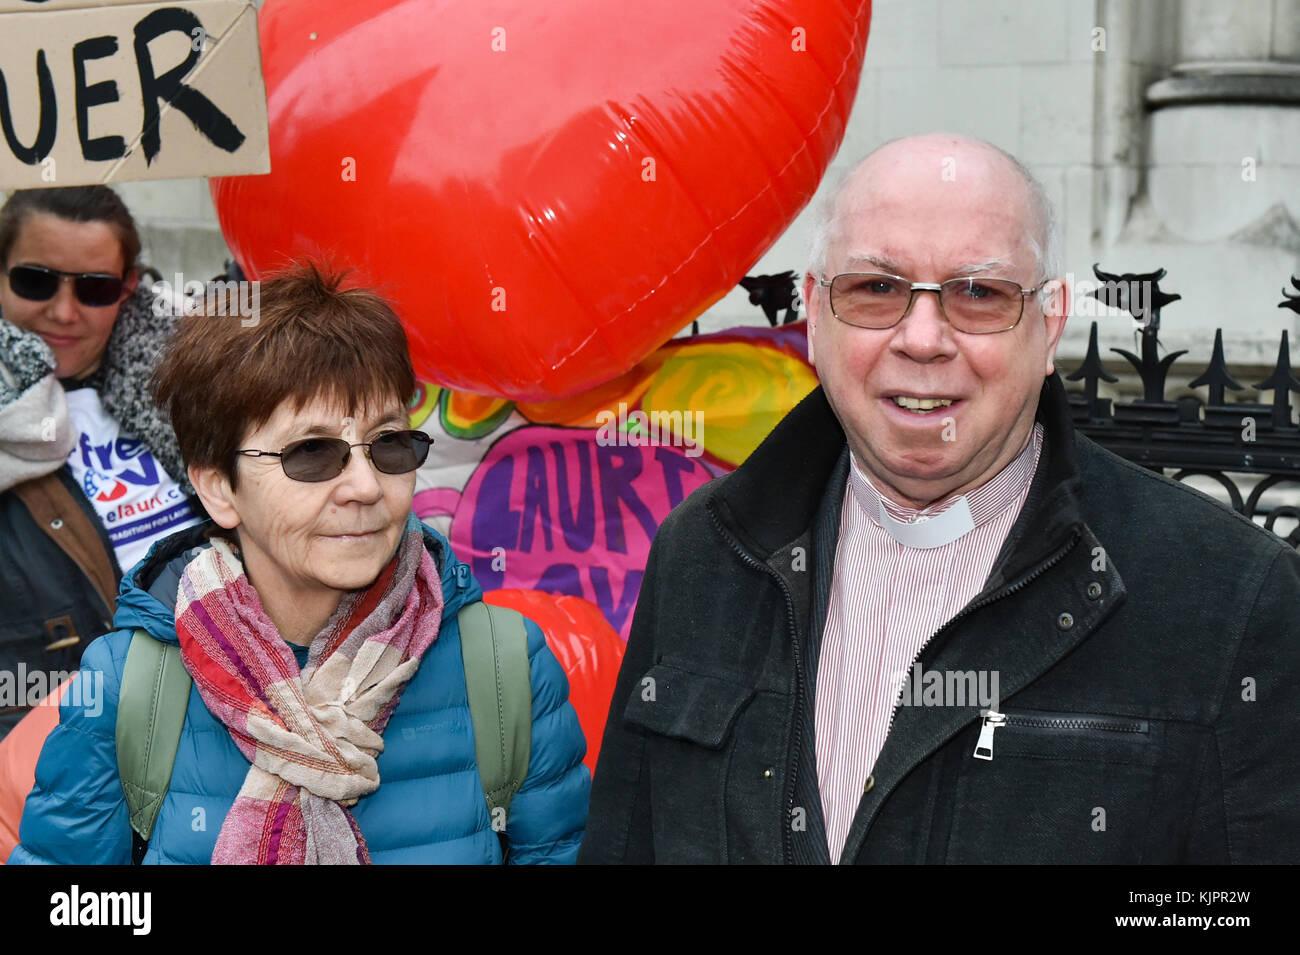 London, United Kingdom. 29 November 2017. Reverend Alexander Love and Sirkka-Liisa Love outside the Royal Courts Stock Photo